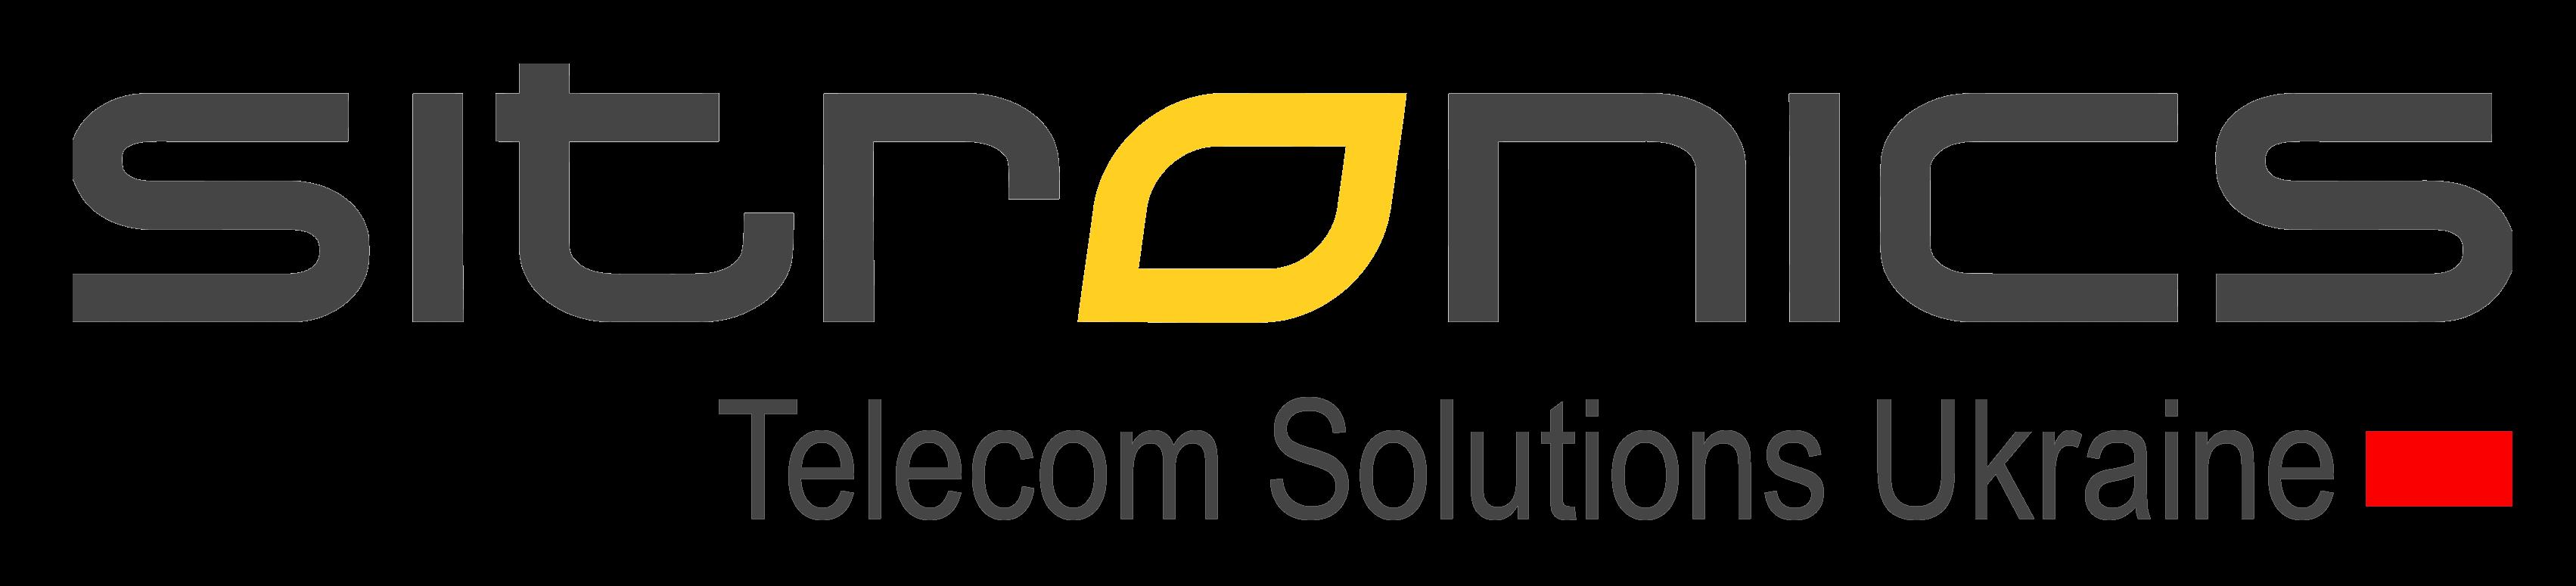 Sitronics Telecom Solutions Ukraine logo